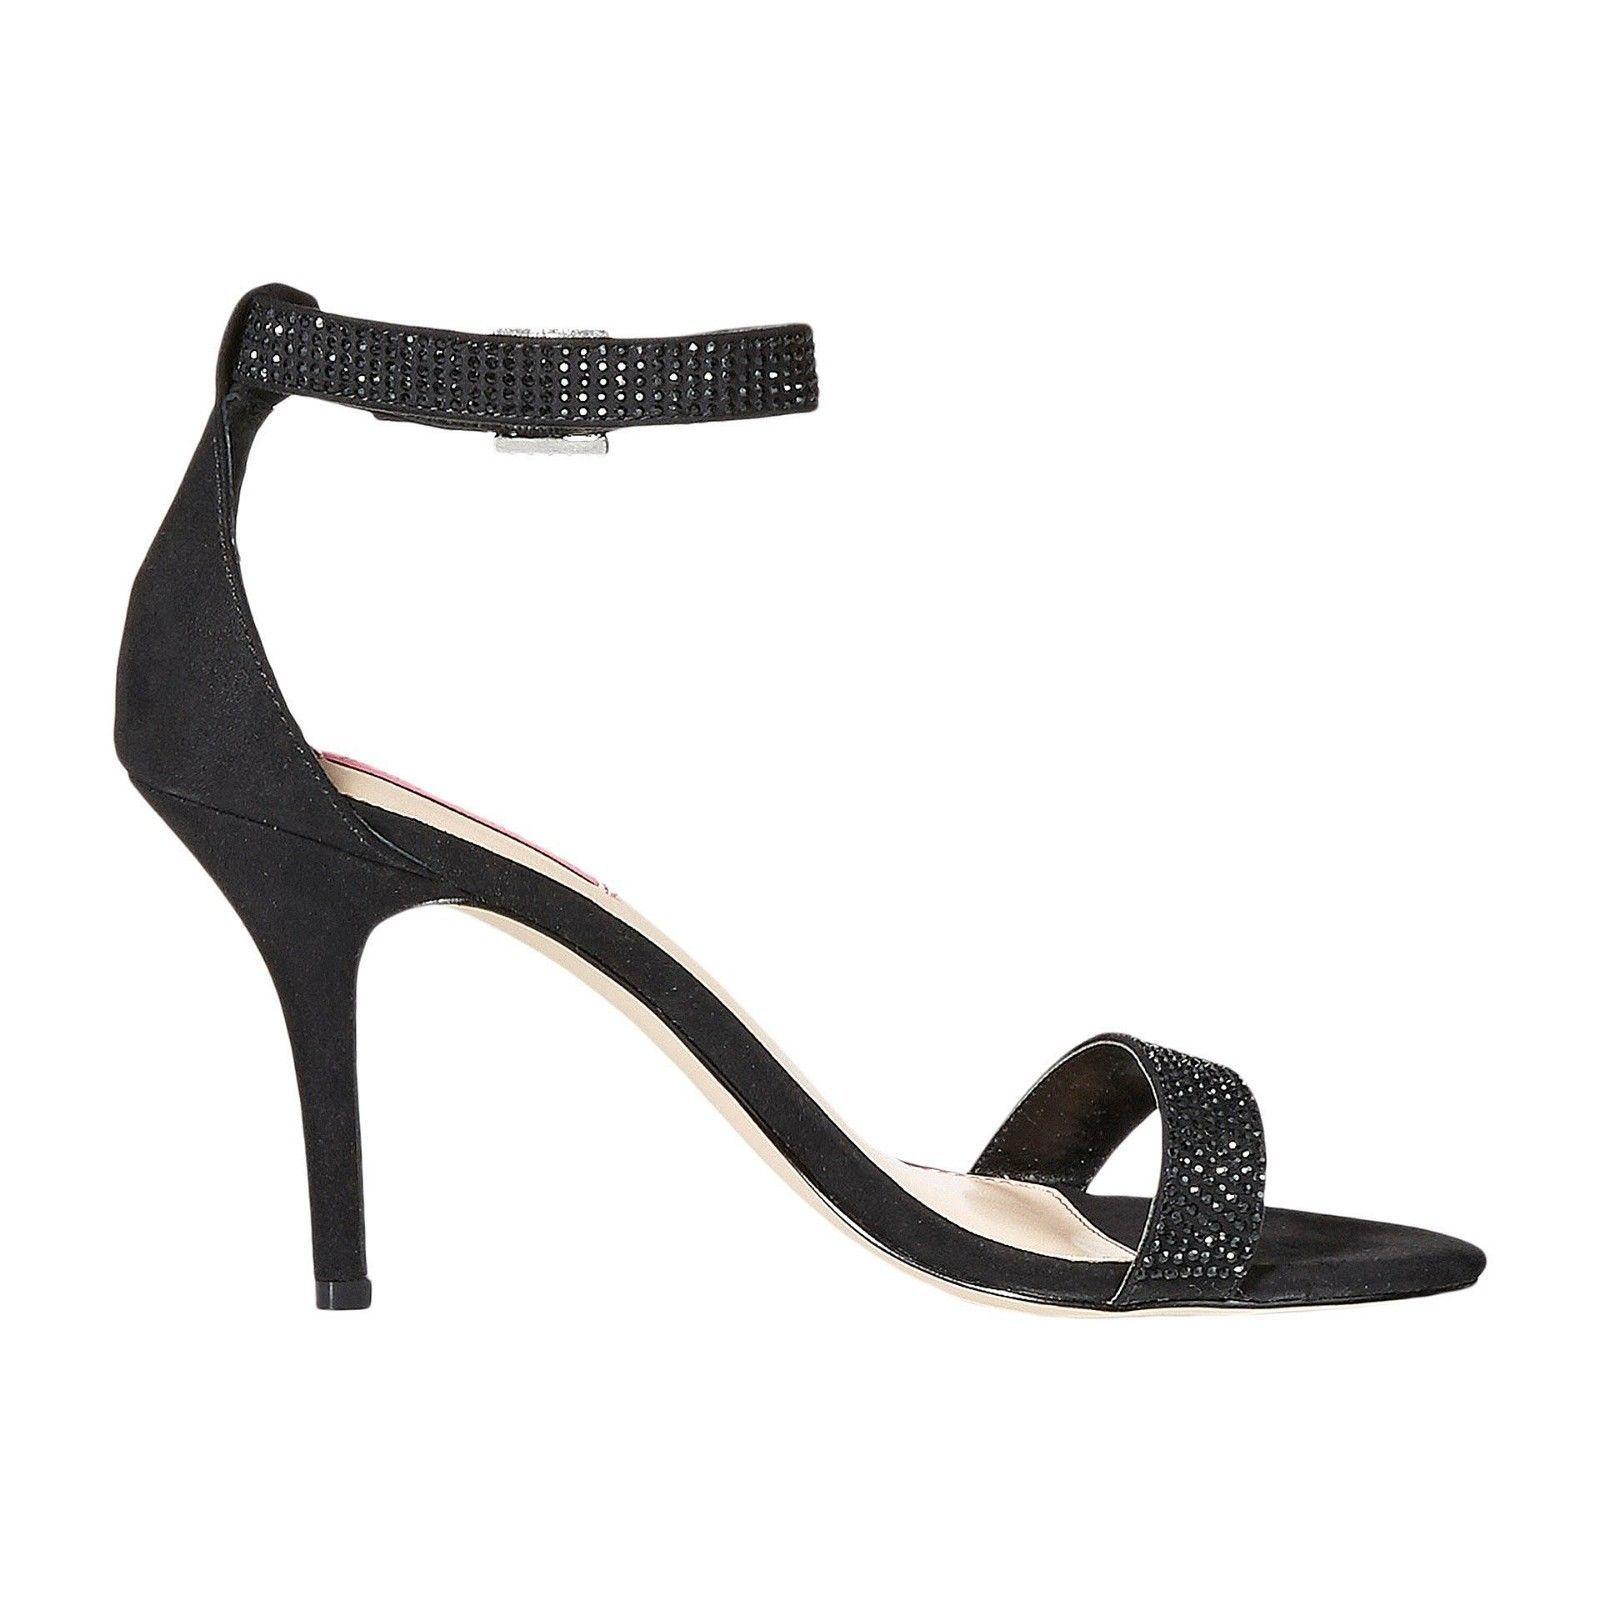 Betsey Johnson Brodway Black Satin Crystal Ankle Strap Heel Pumps 10 NIB